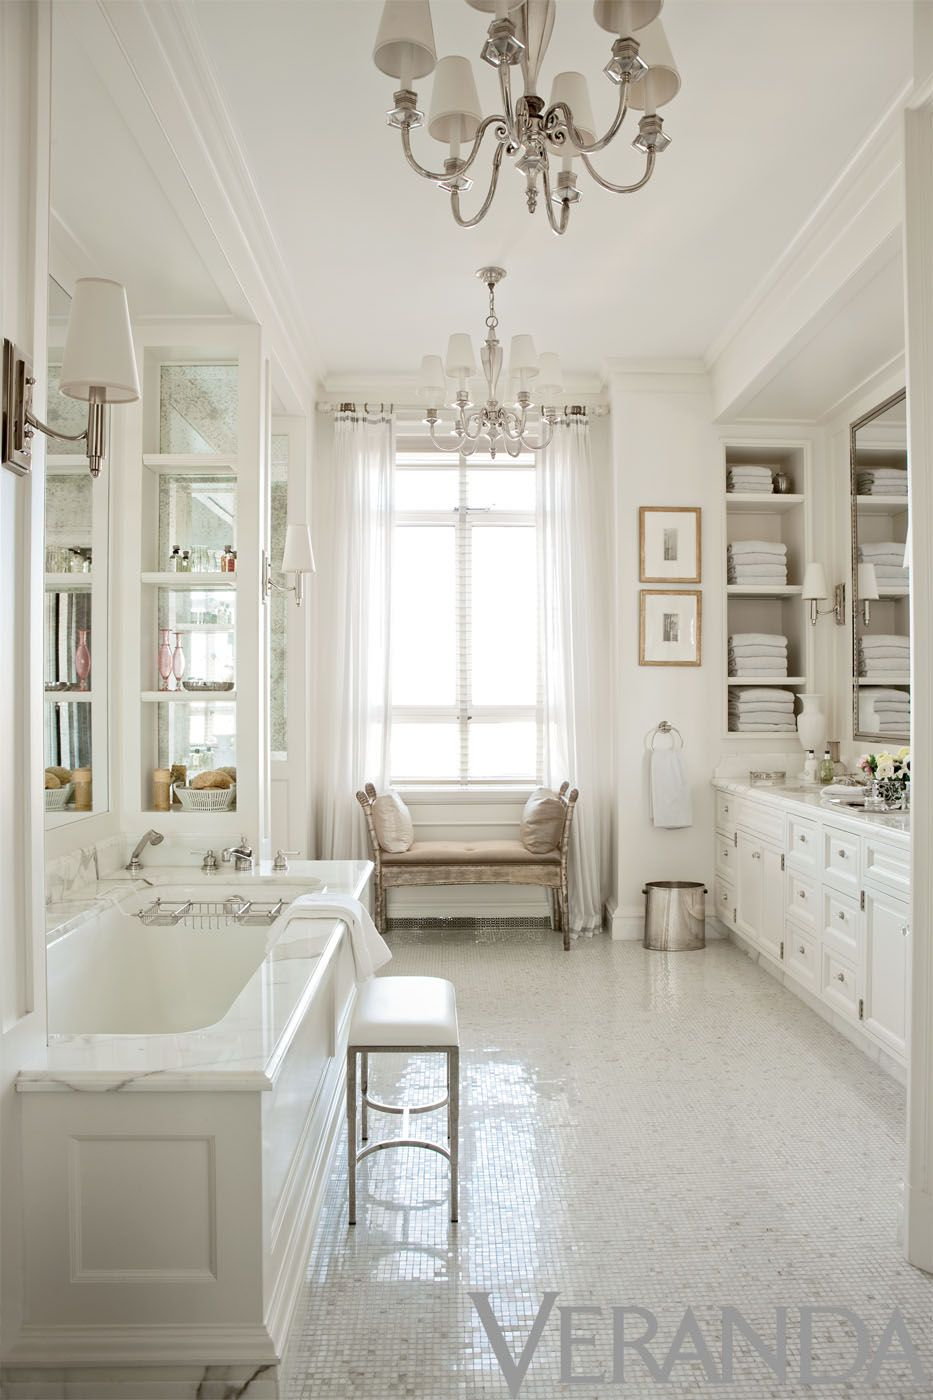 Interior design by thomas oubrien photograph by melanie acevedo